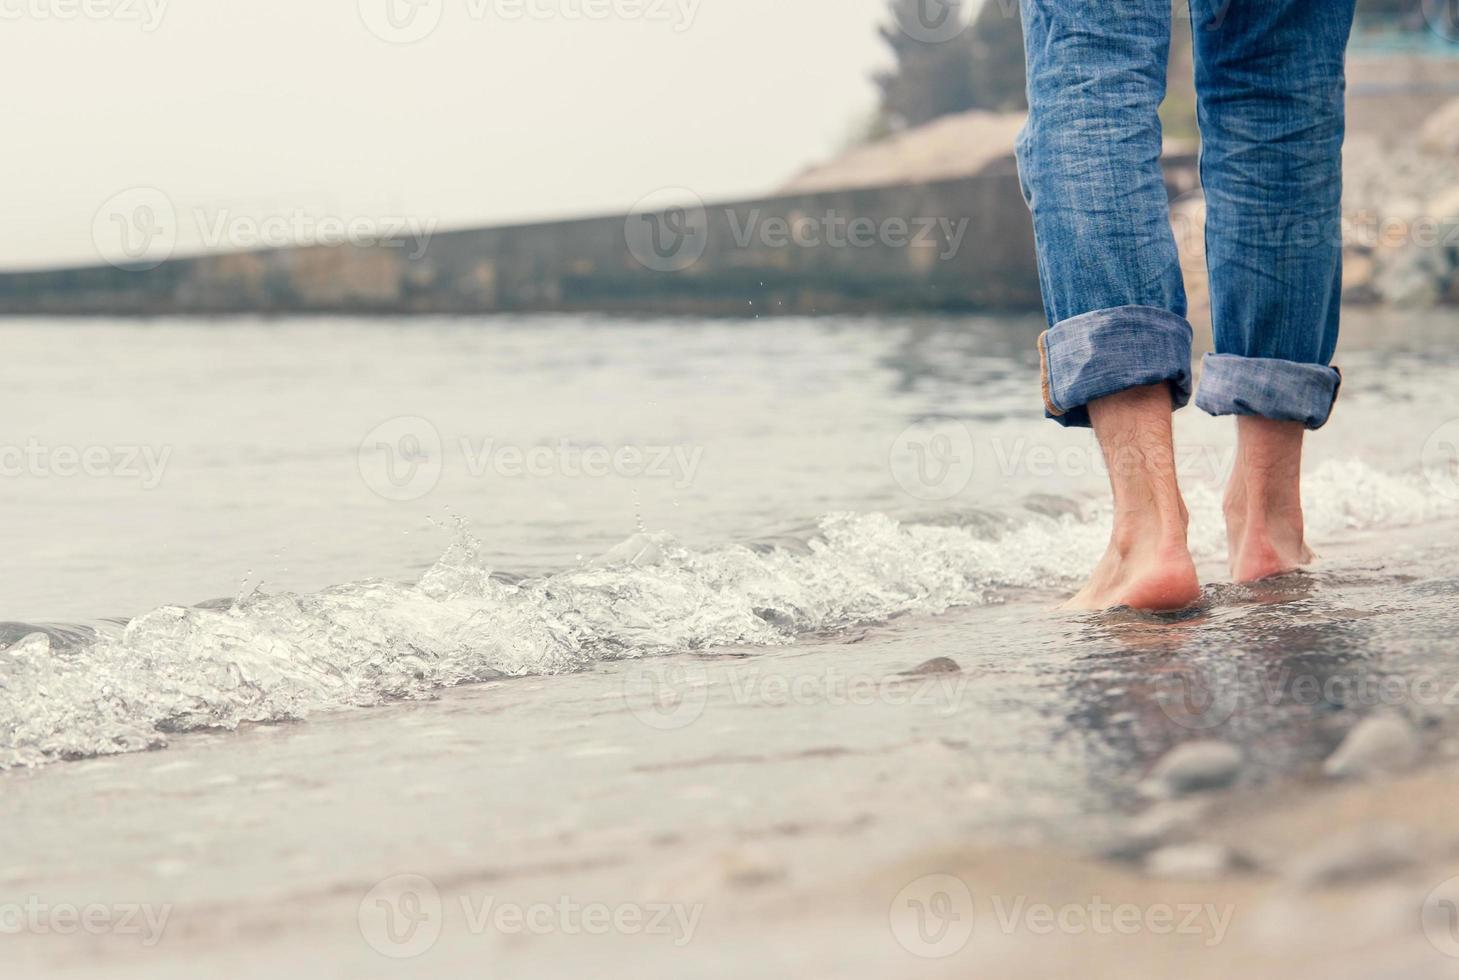 närbild bild barfota man ben i havet surfa foto